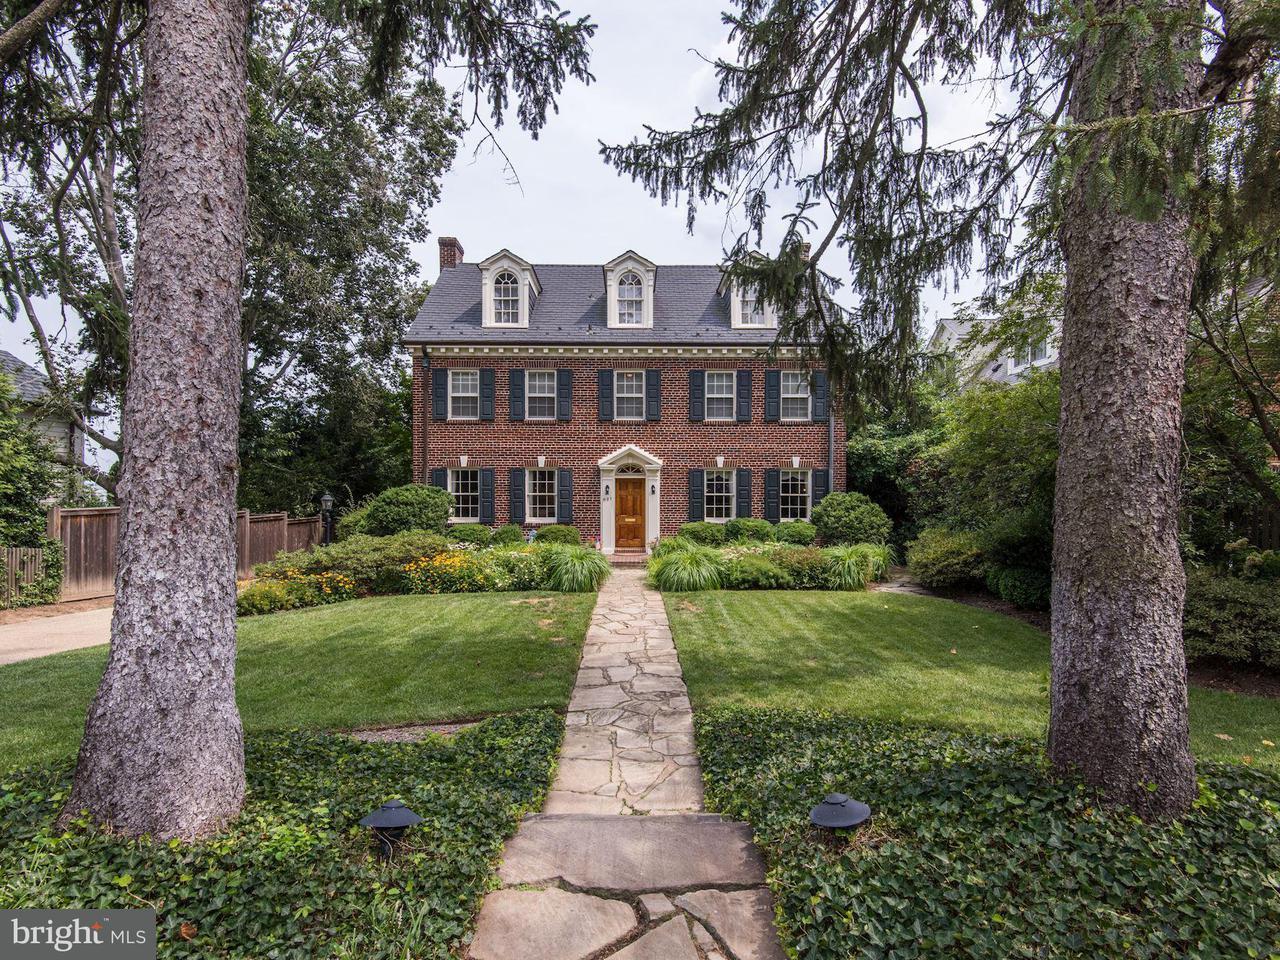 Single Family Home for Sale at 6127 VERNON TER 6127 VERNON TER Alexandria, Virginia 22307 United States